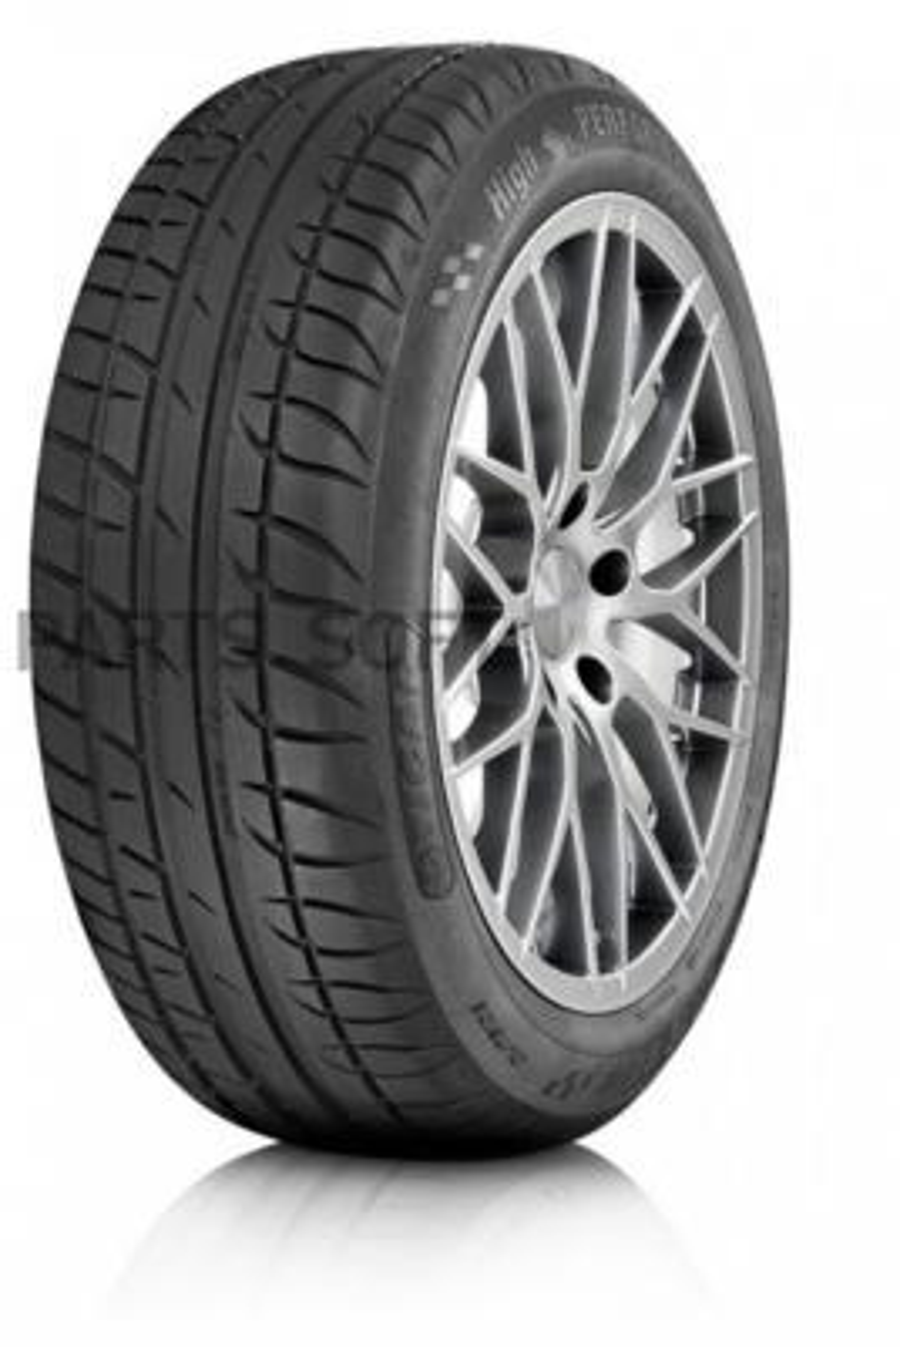 HIGH PERFORMANCE 215/45R16 90V (до 240 км/ч)